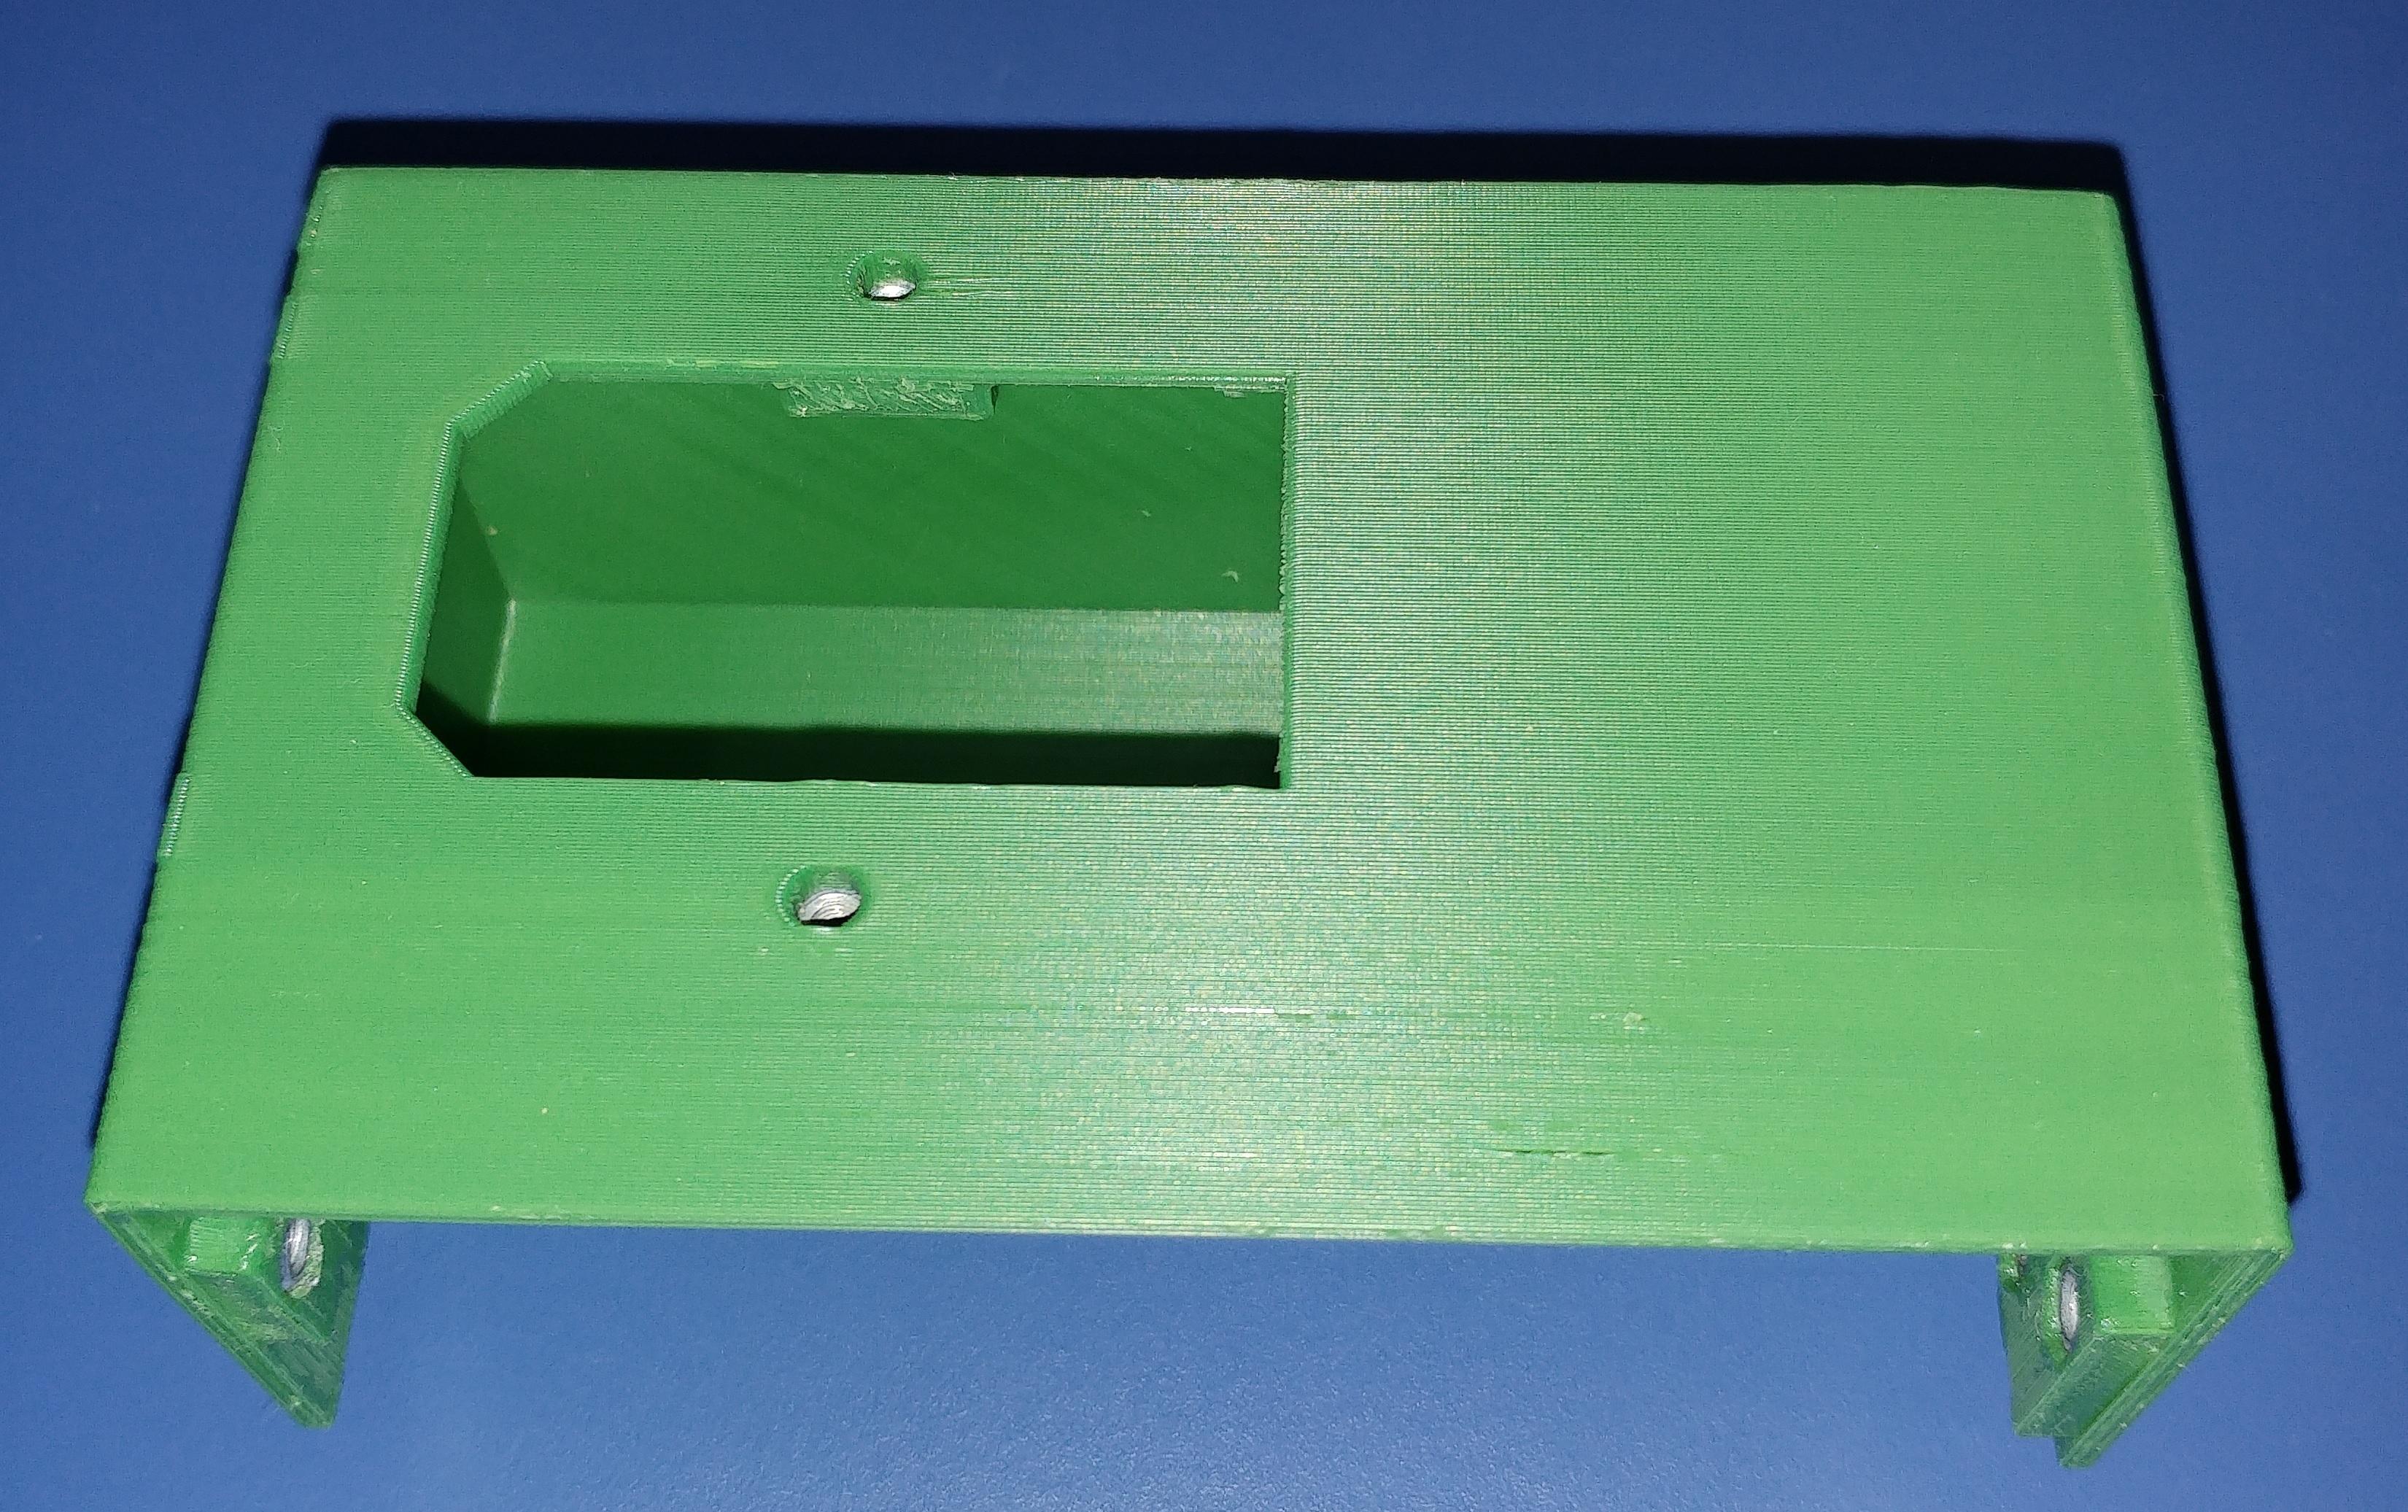 1.jpg Télécharger fichier STL gratuit Carcasa Fuente de Alimentación con interruptor de encendido • Plan pour imprimante 3D, celtarra12